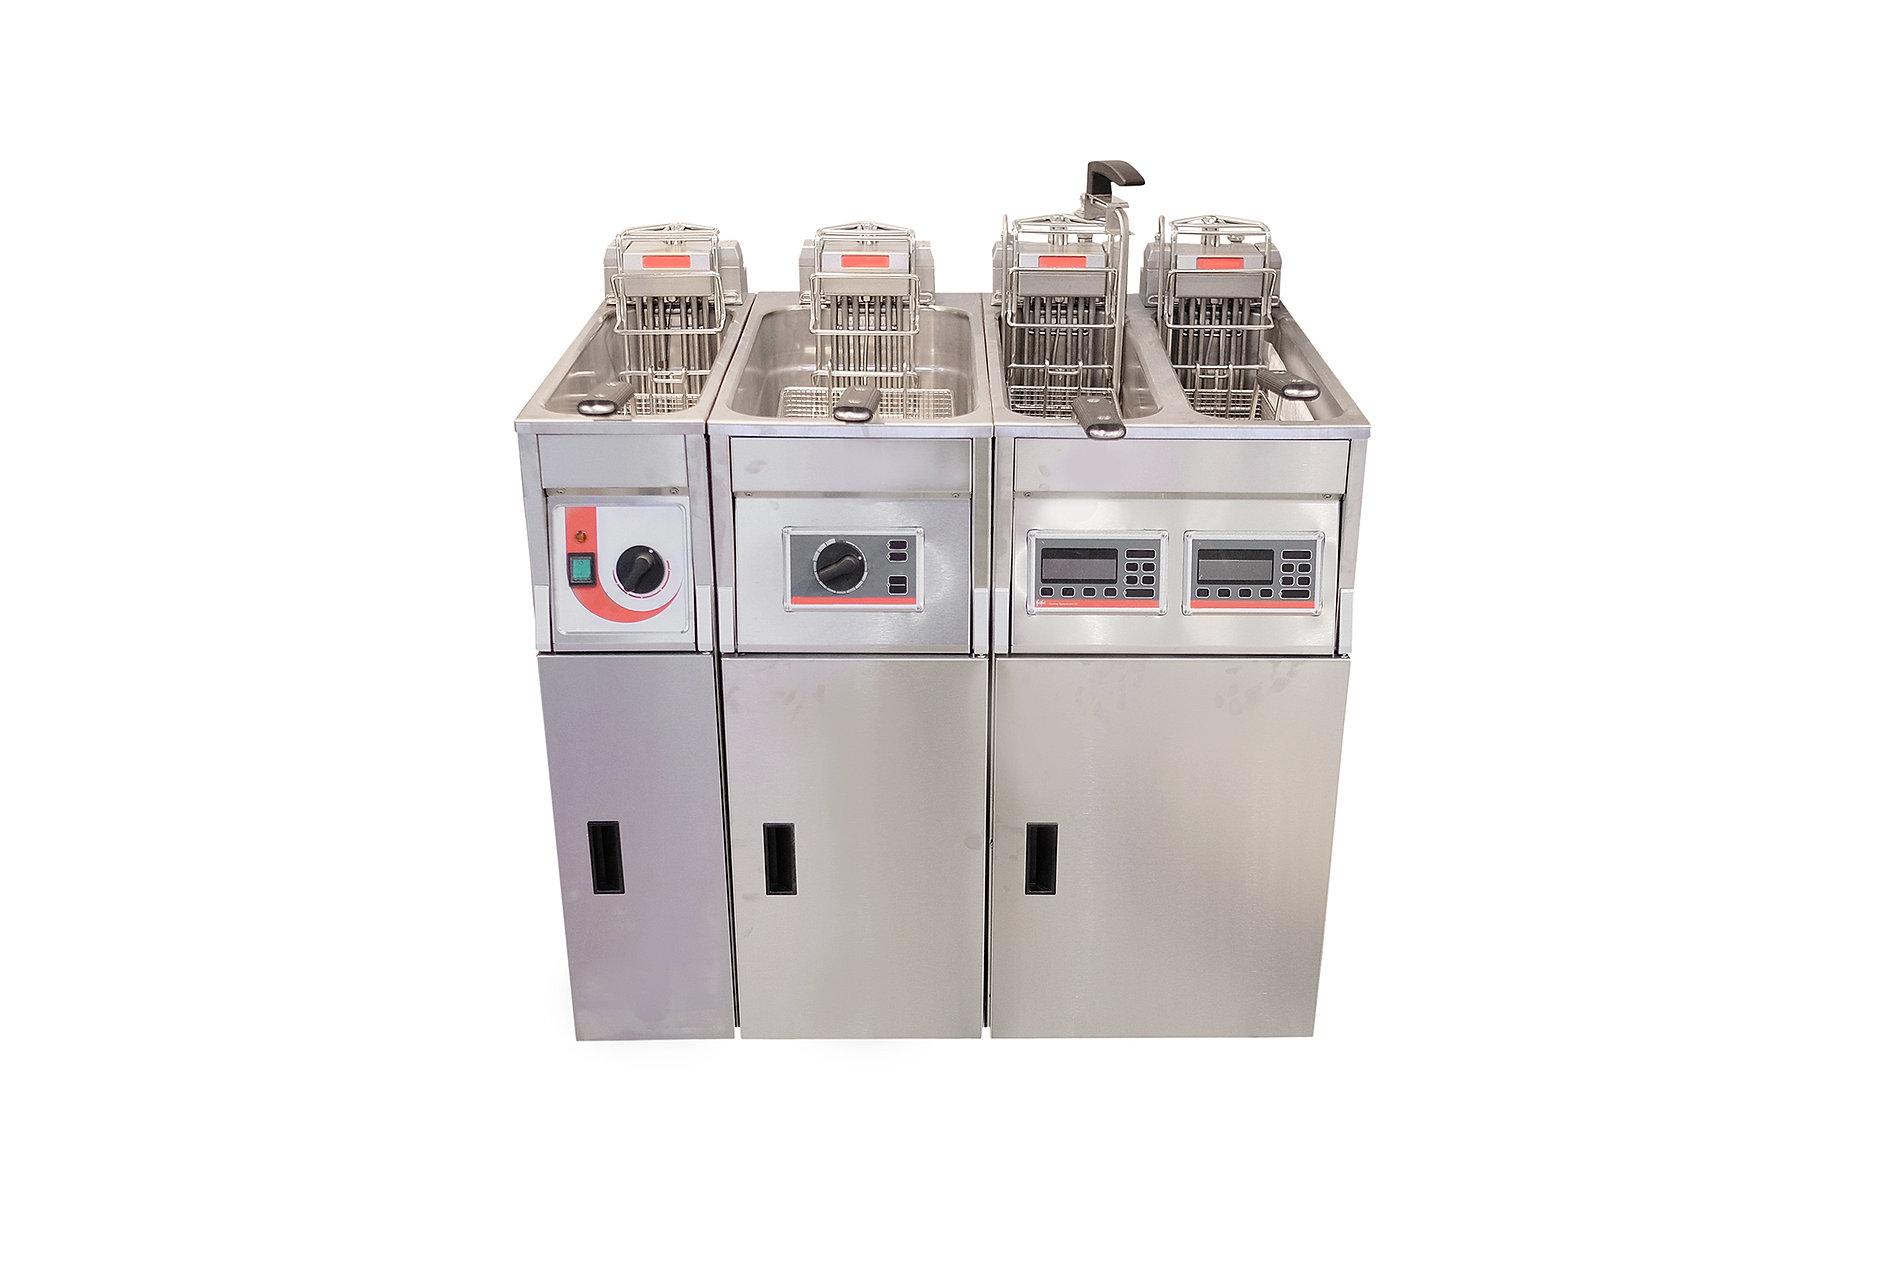 kitchen equipment repair home depot financing remodel commercial maryland delaware